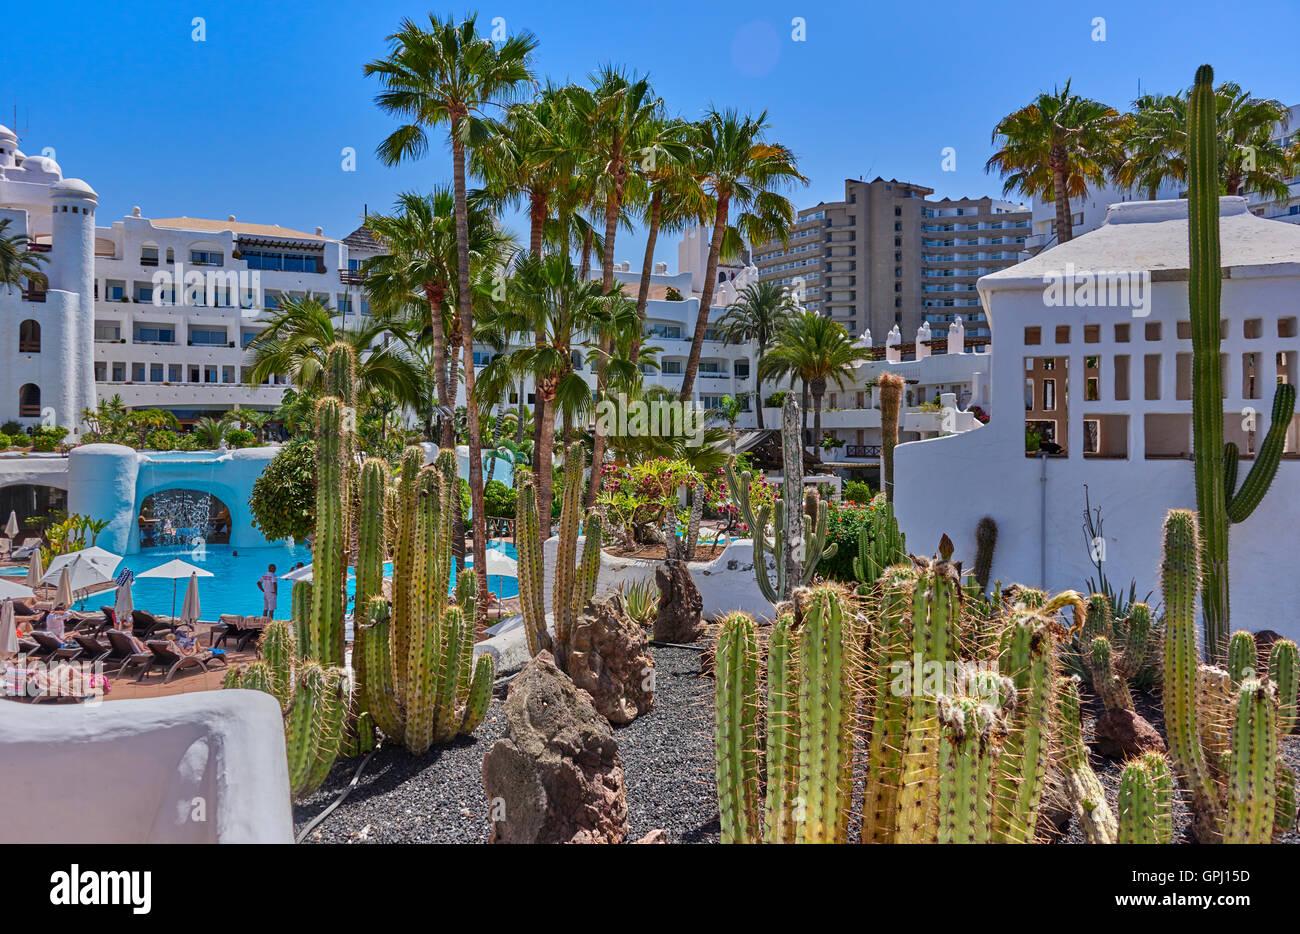 Hotel Jardin Tropical Costa Adeje Tenerife Stock Photo 117180713